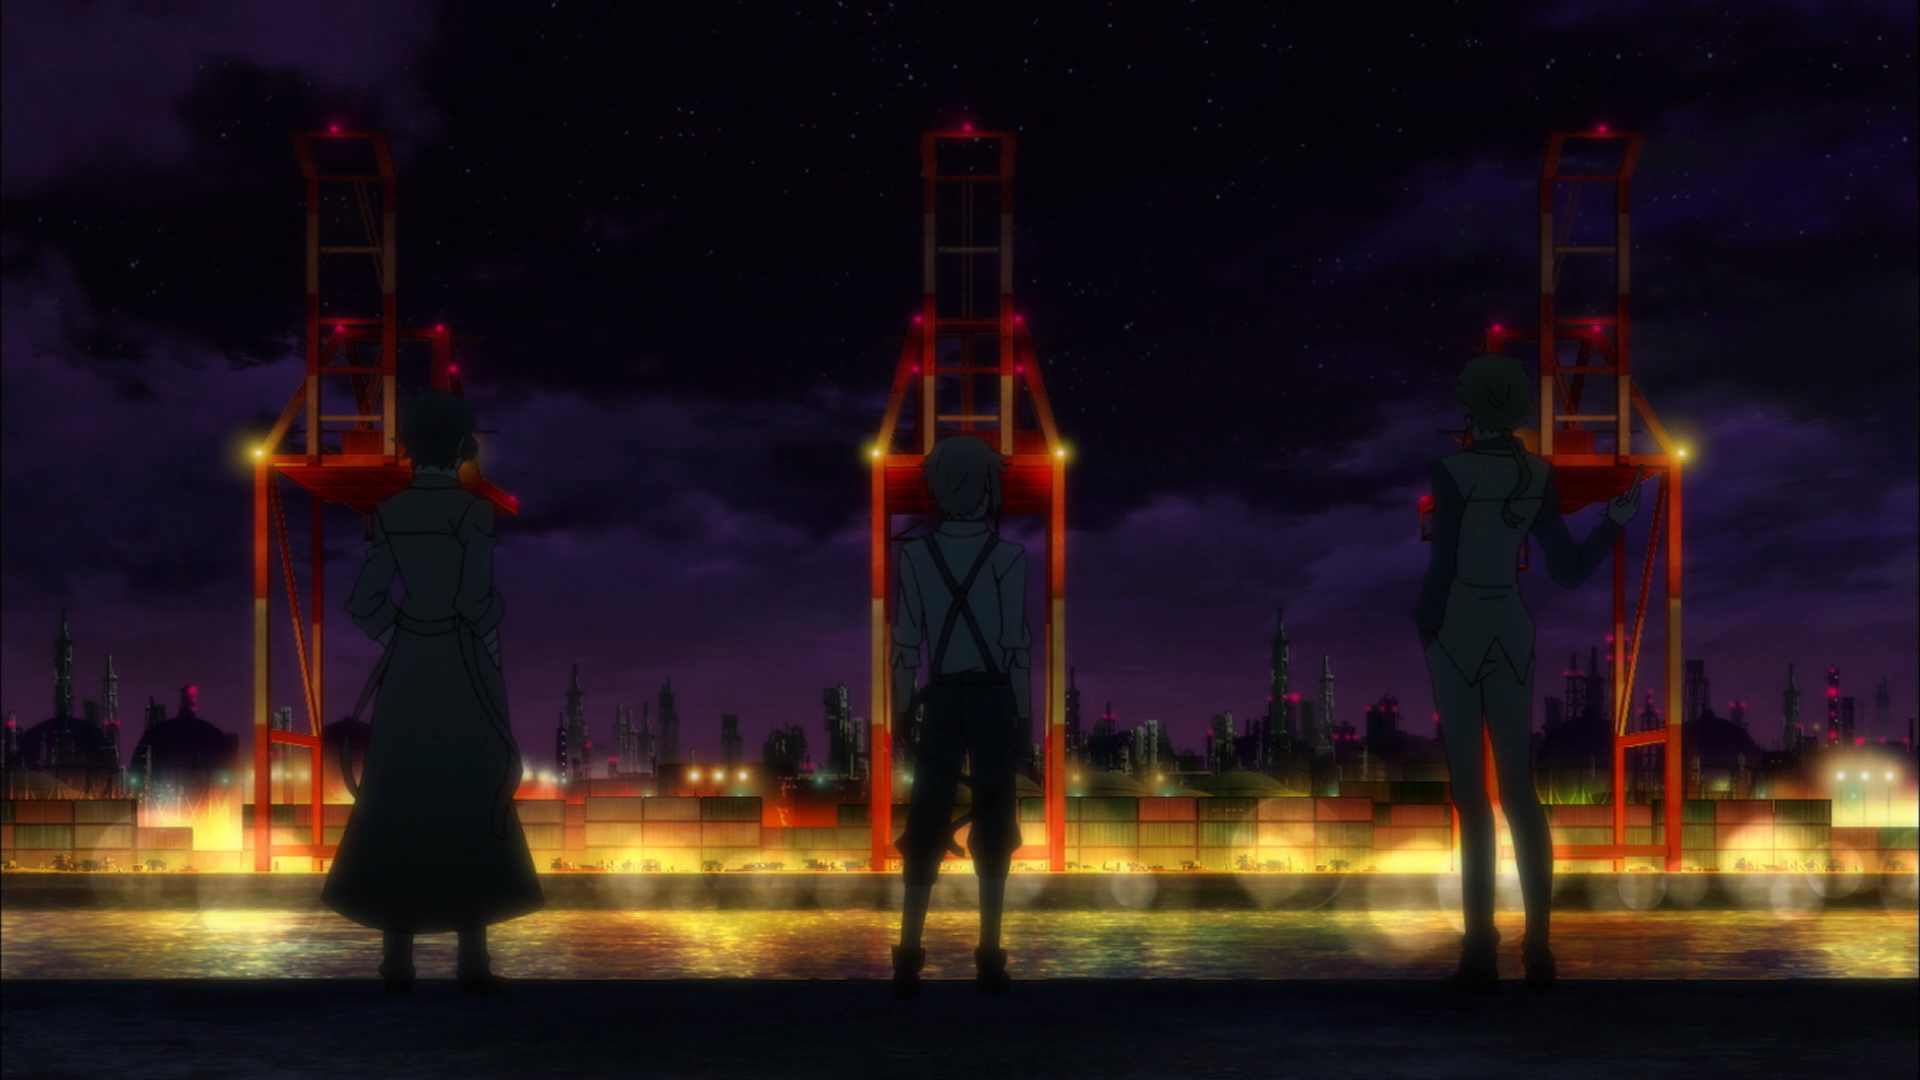 Bungou Stray Dogs / Episode 6 / Dazai, Atsushi, and Kunikida standing next to one another